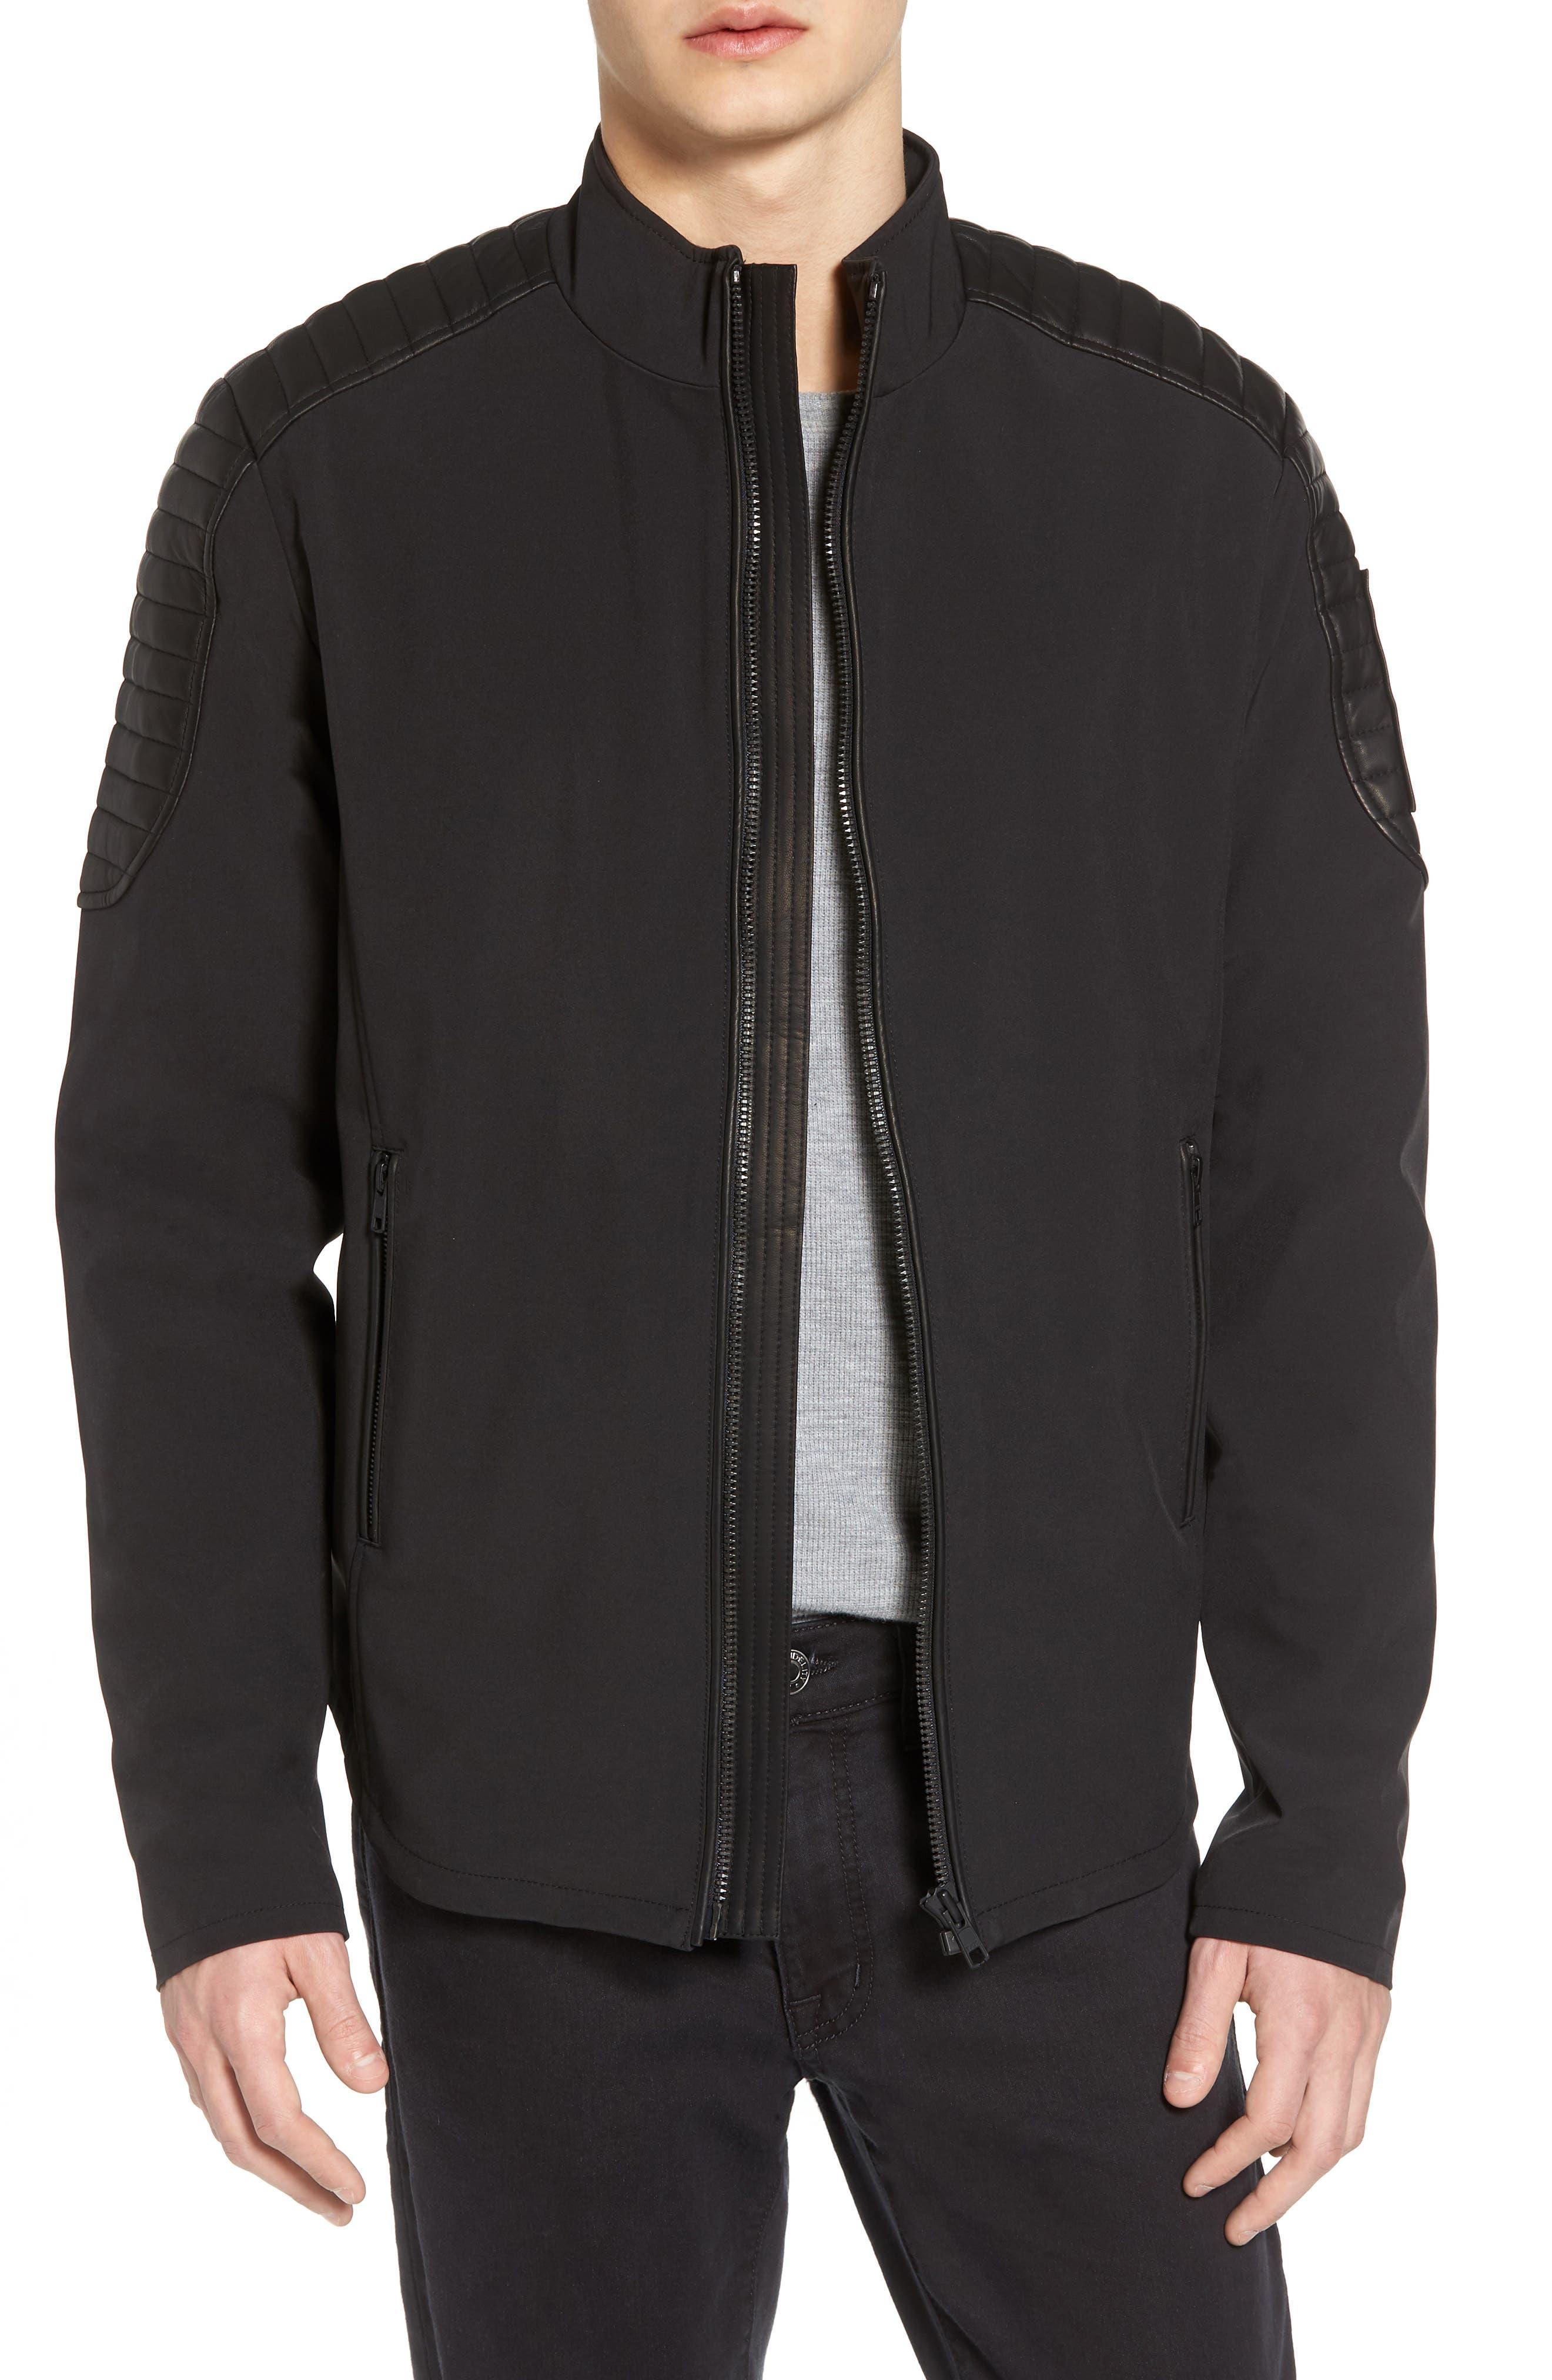 Grindstone Water Repellent Jacket,                             Main thumbnail 1, color,                             Black